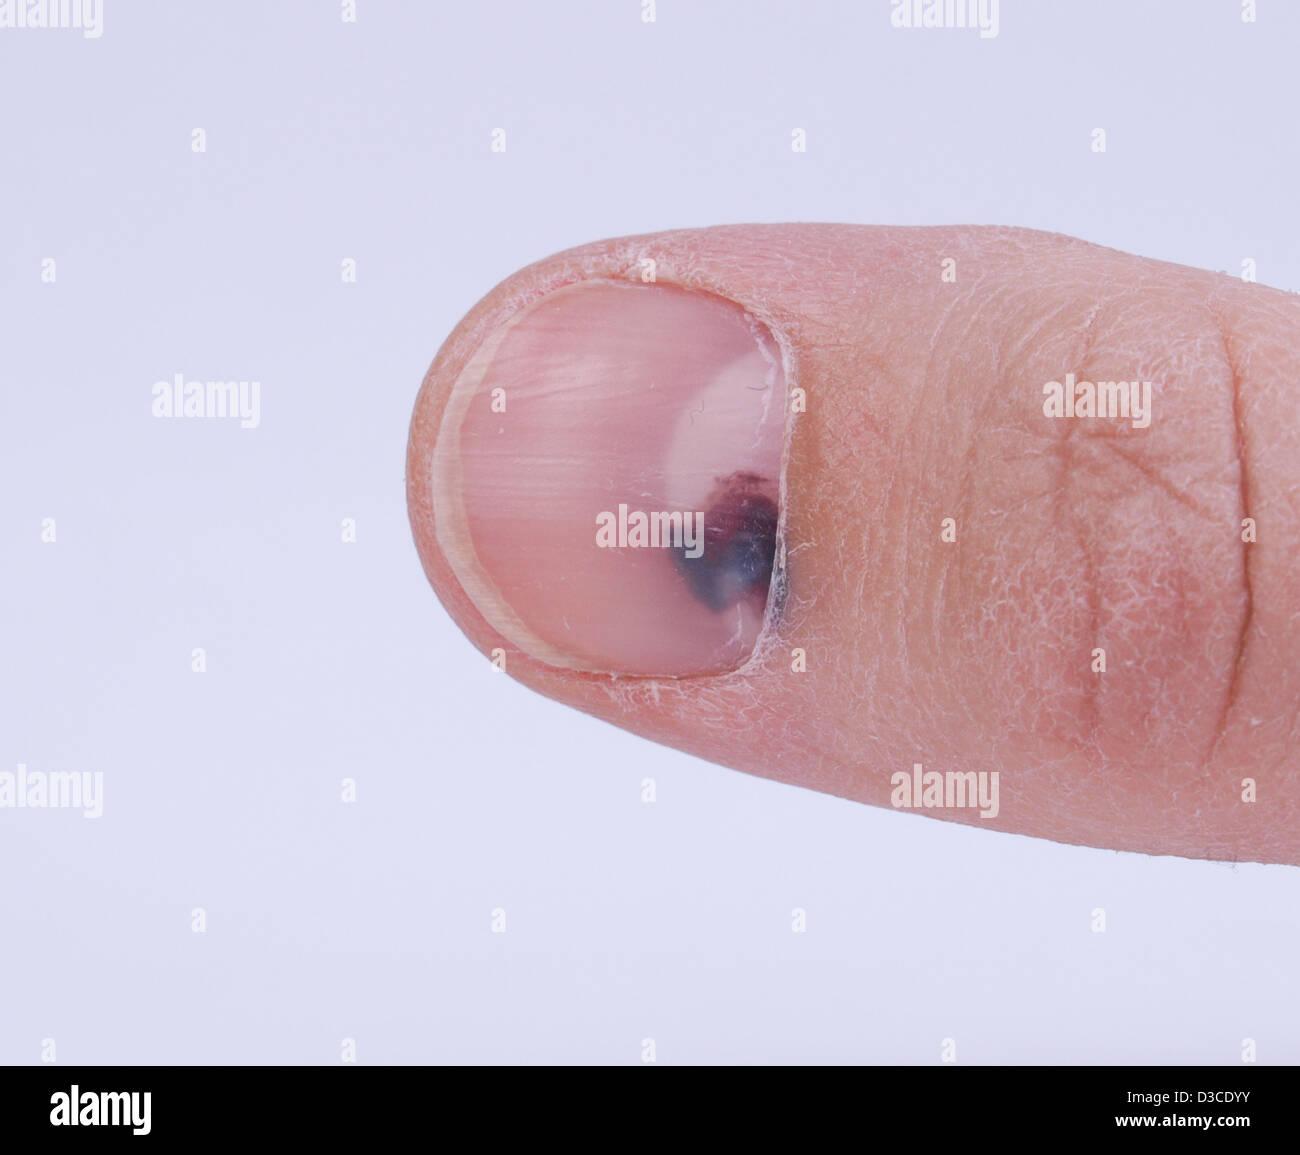 Dem zehennagel unter bluterguss Verdickte Zehennägel